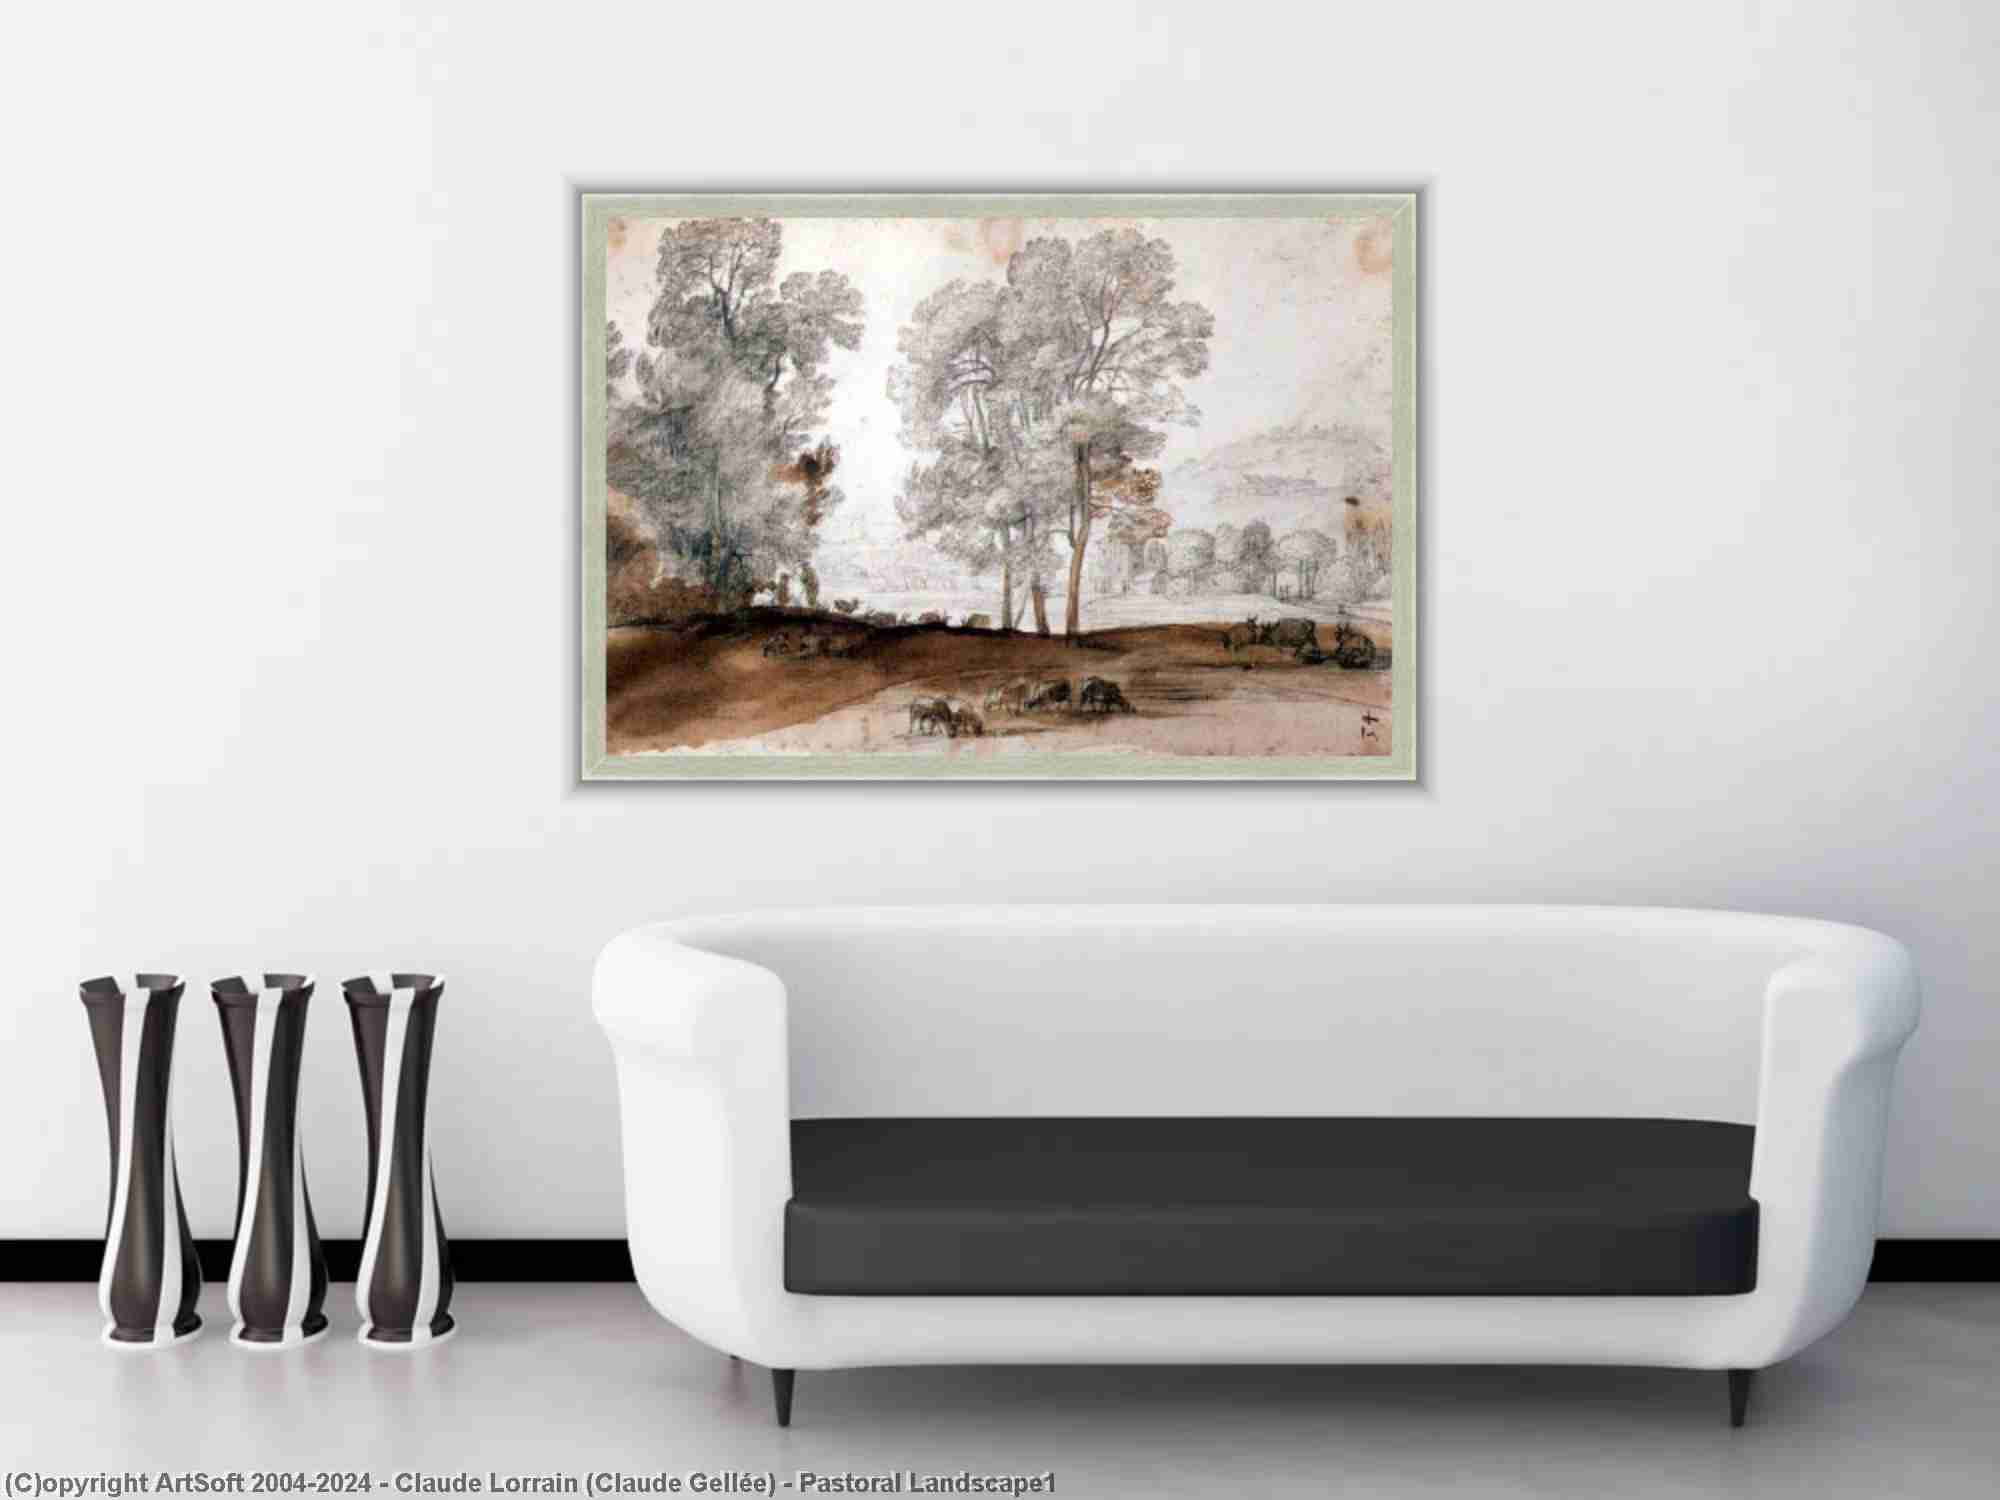 Claude Lorrain (Claude Gellée) - Pastoral Landscape1